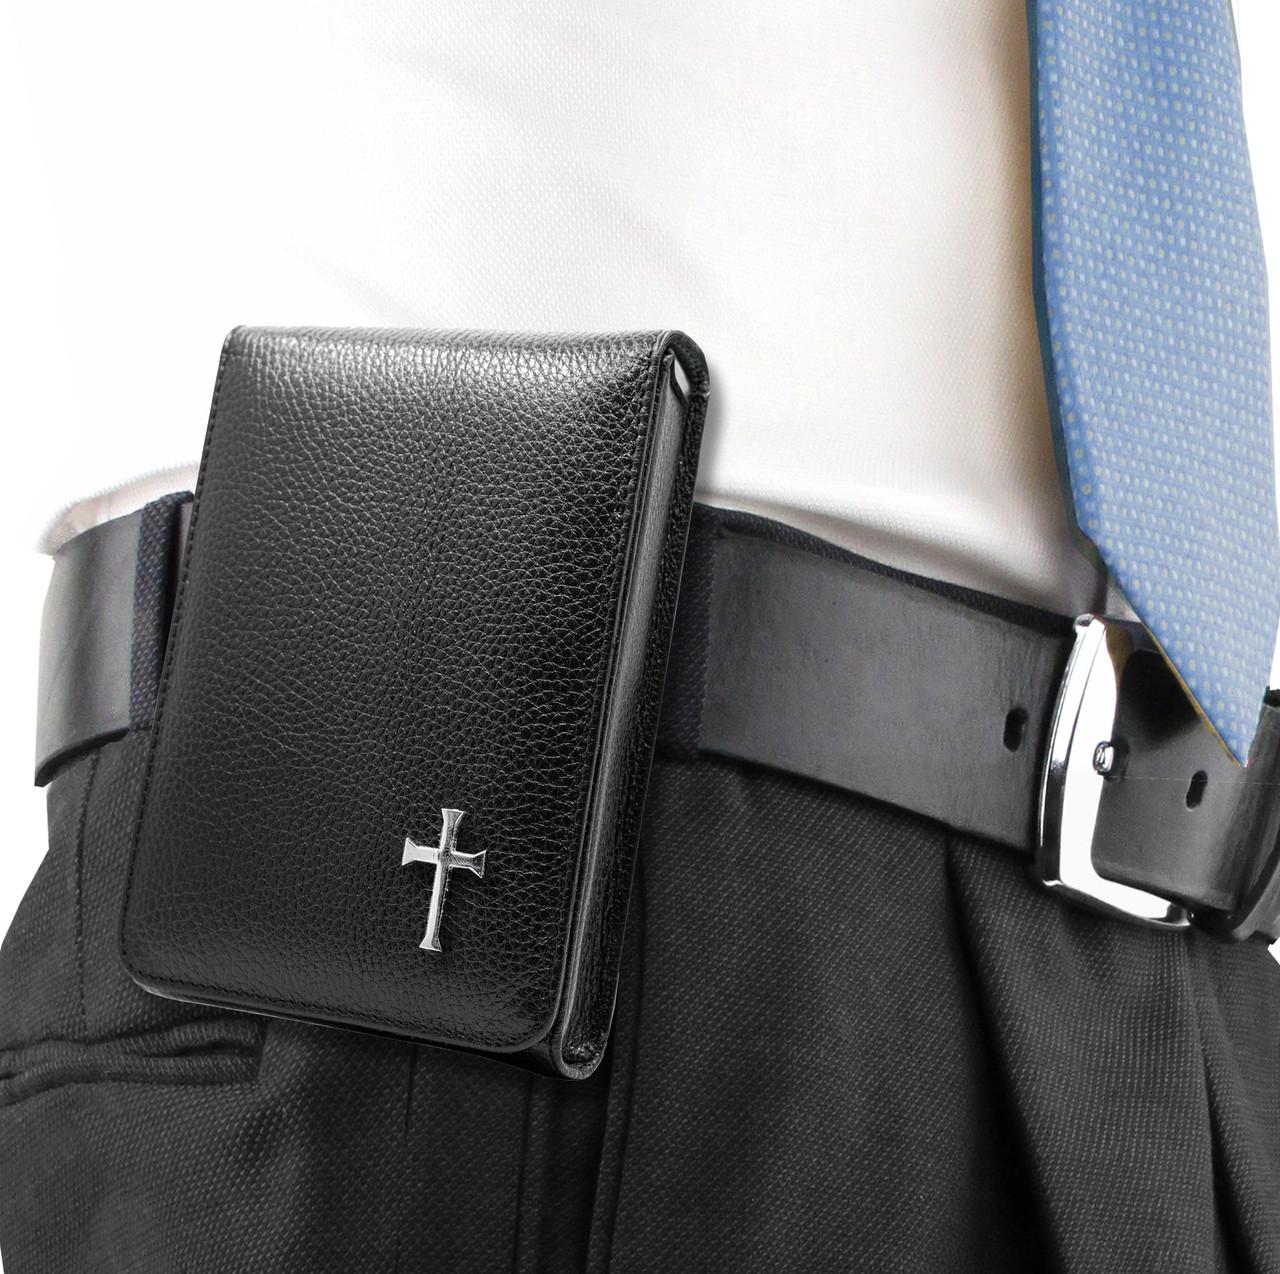 FN 509 Black Leather Cross Series Holster